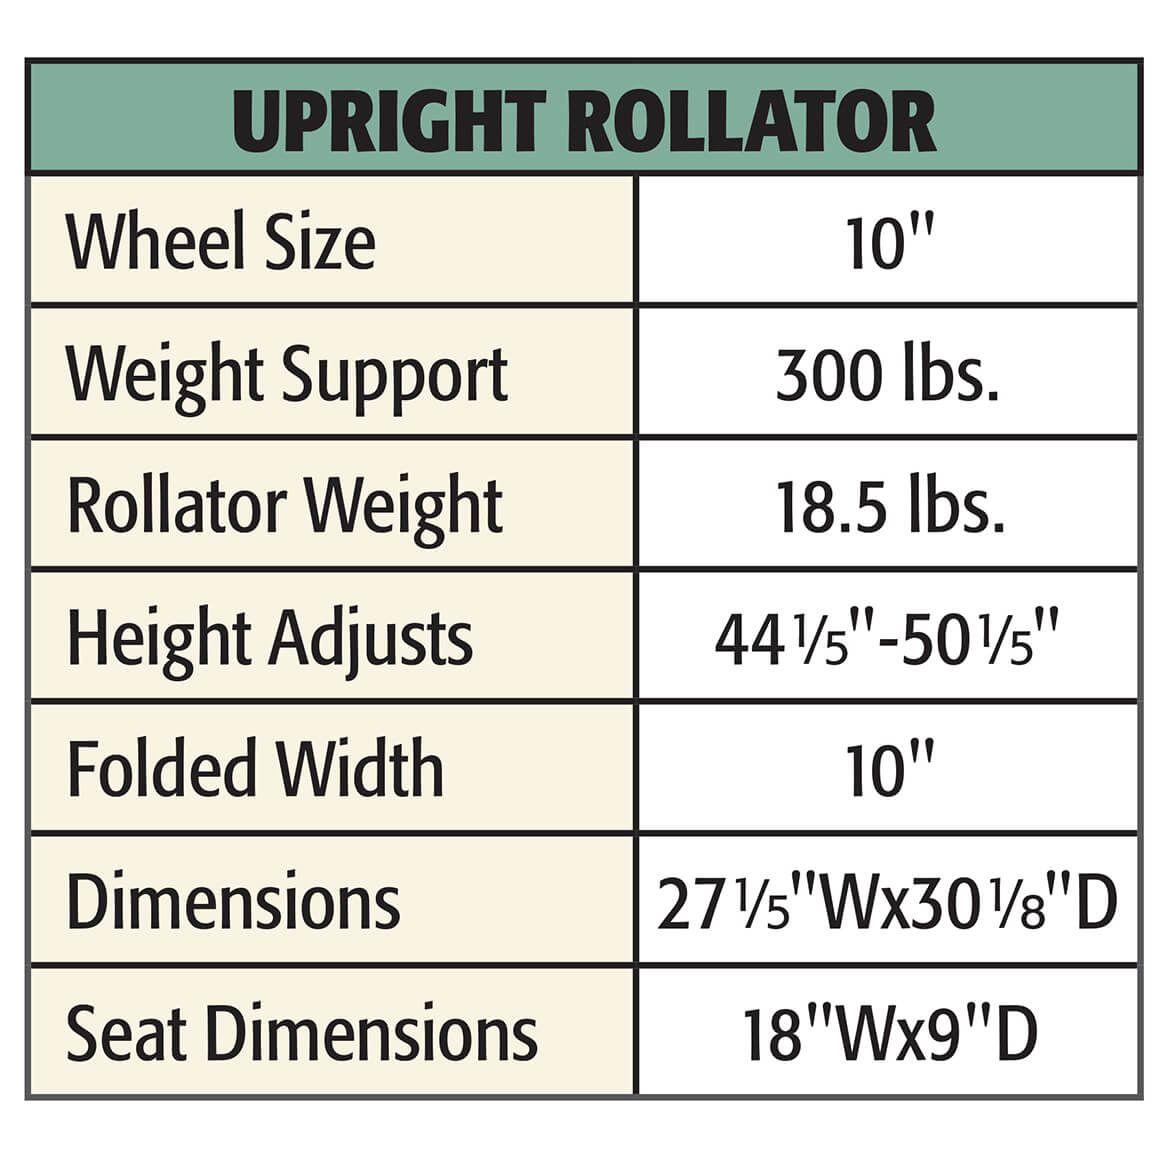 Upright Rollator-372006